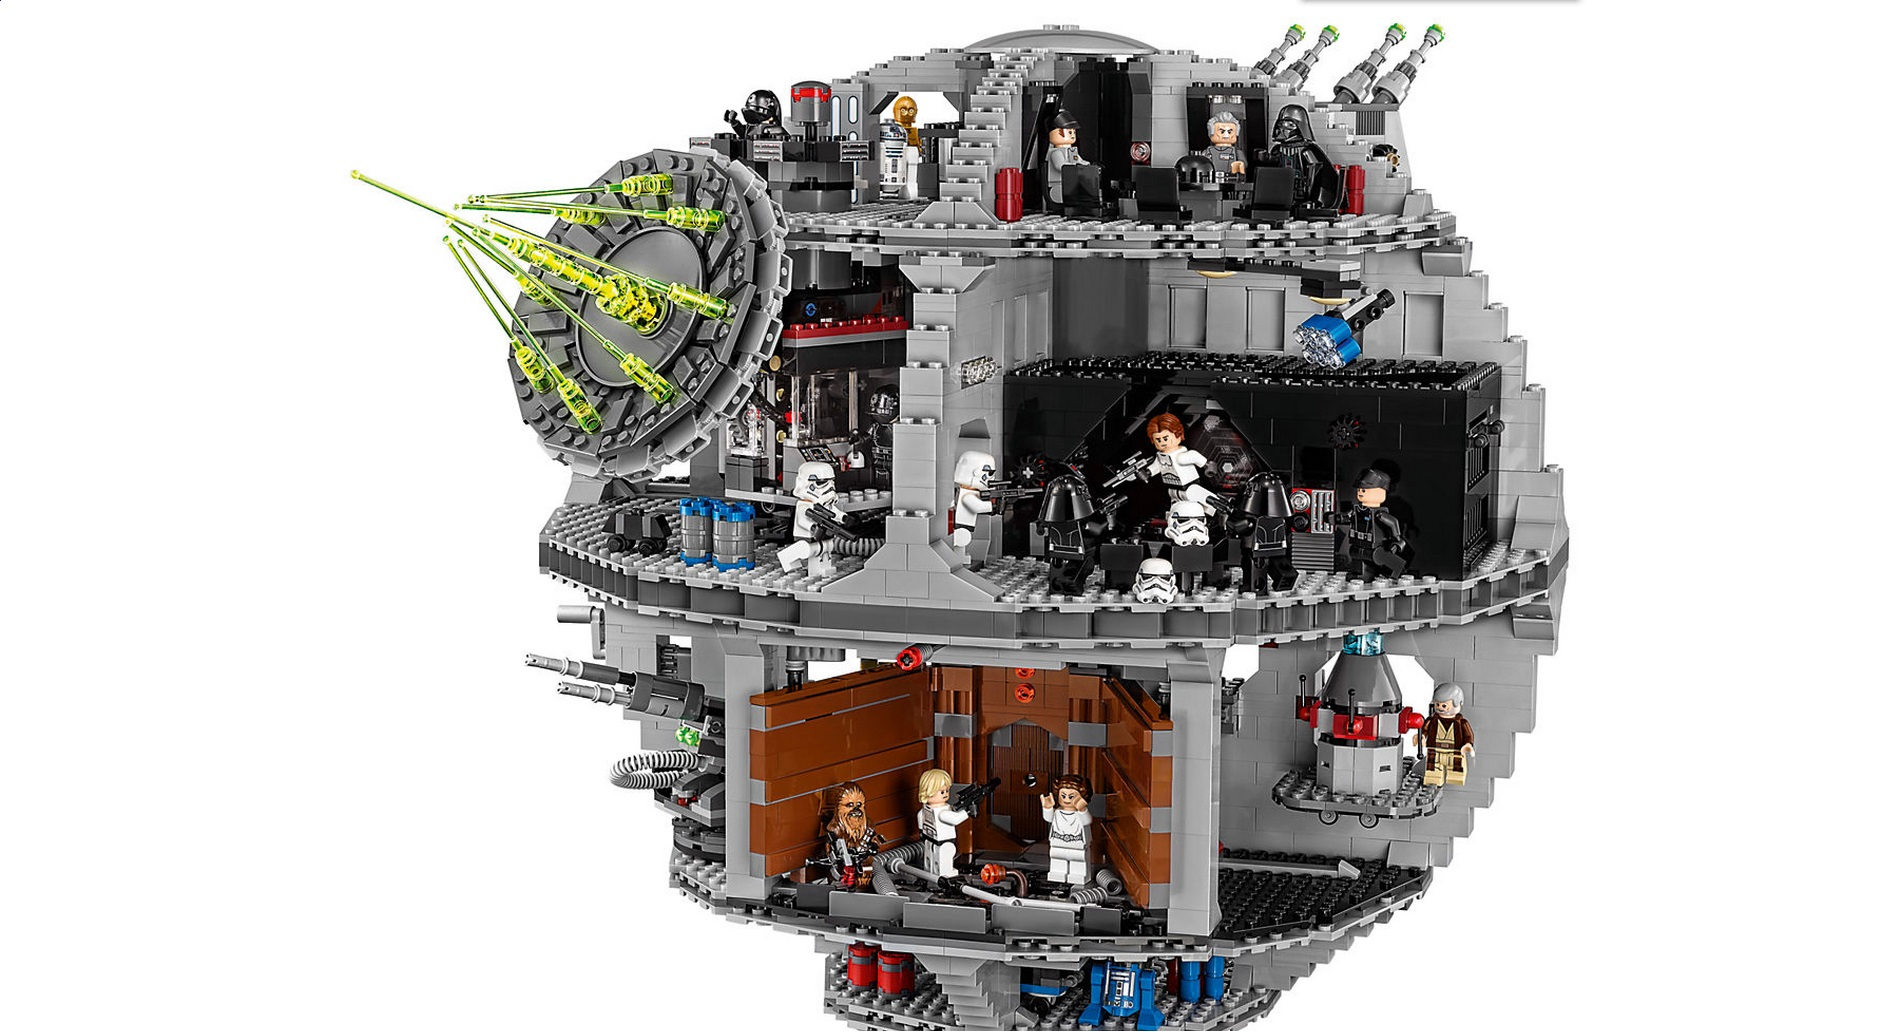 05063 4016pcs New Genuine Star War Force Waken UCS Death Star Building Blocks Bricks Toys Gifts compatible bricks 75159